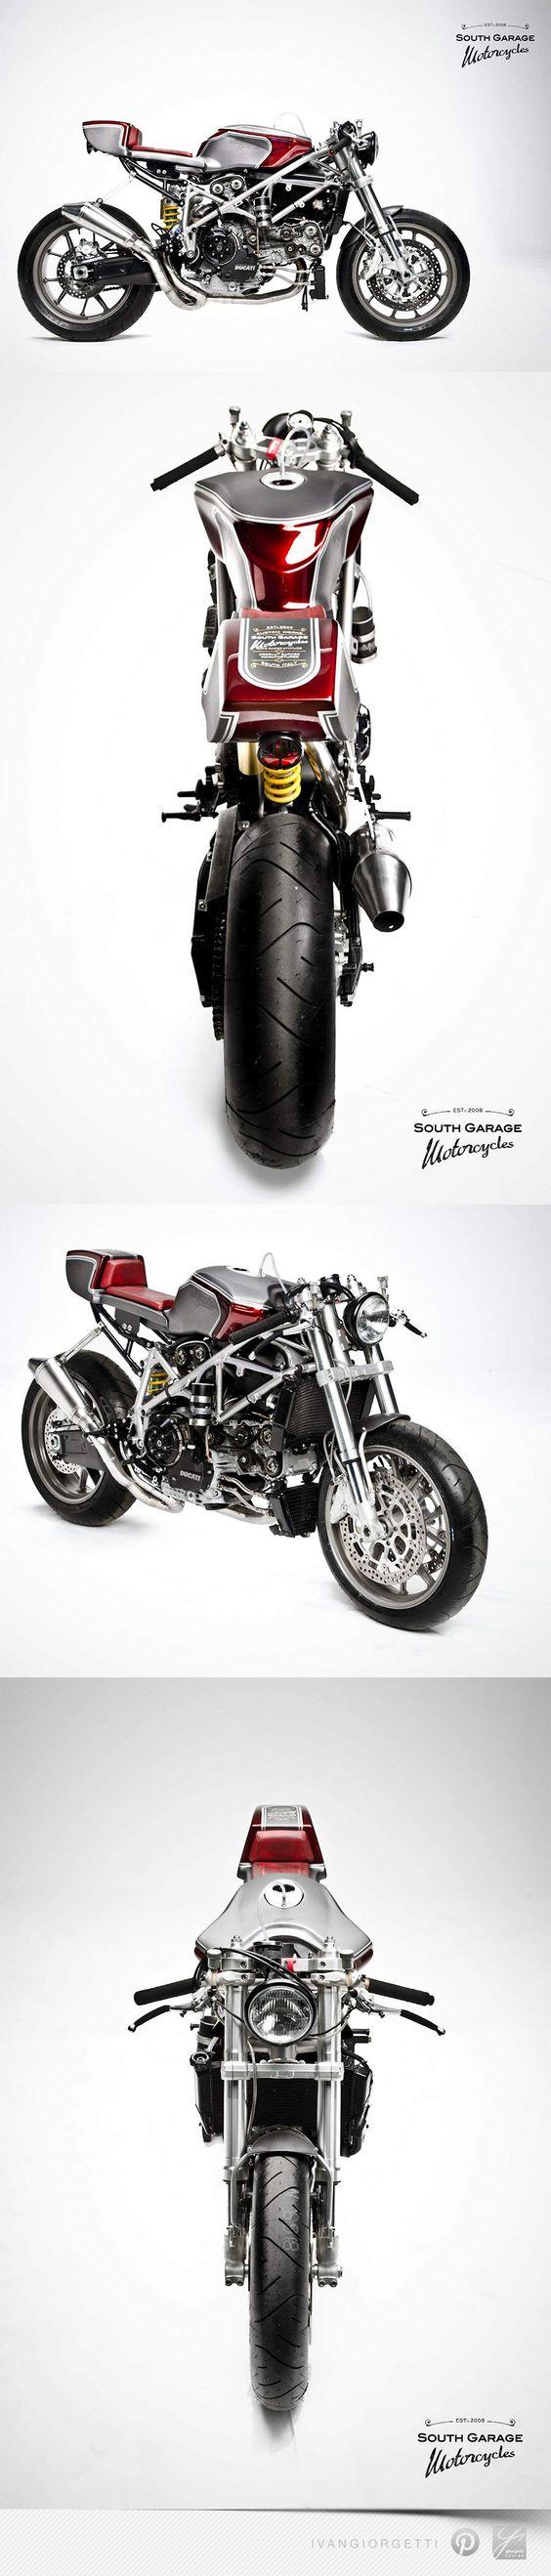 Ducati 749 Cafè Racer by South Garage